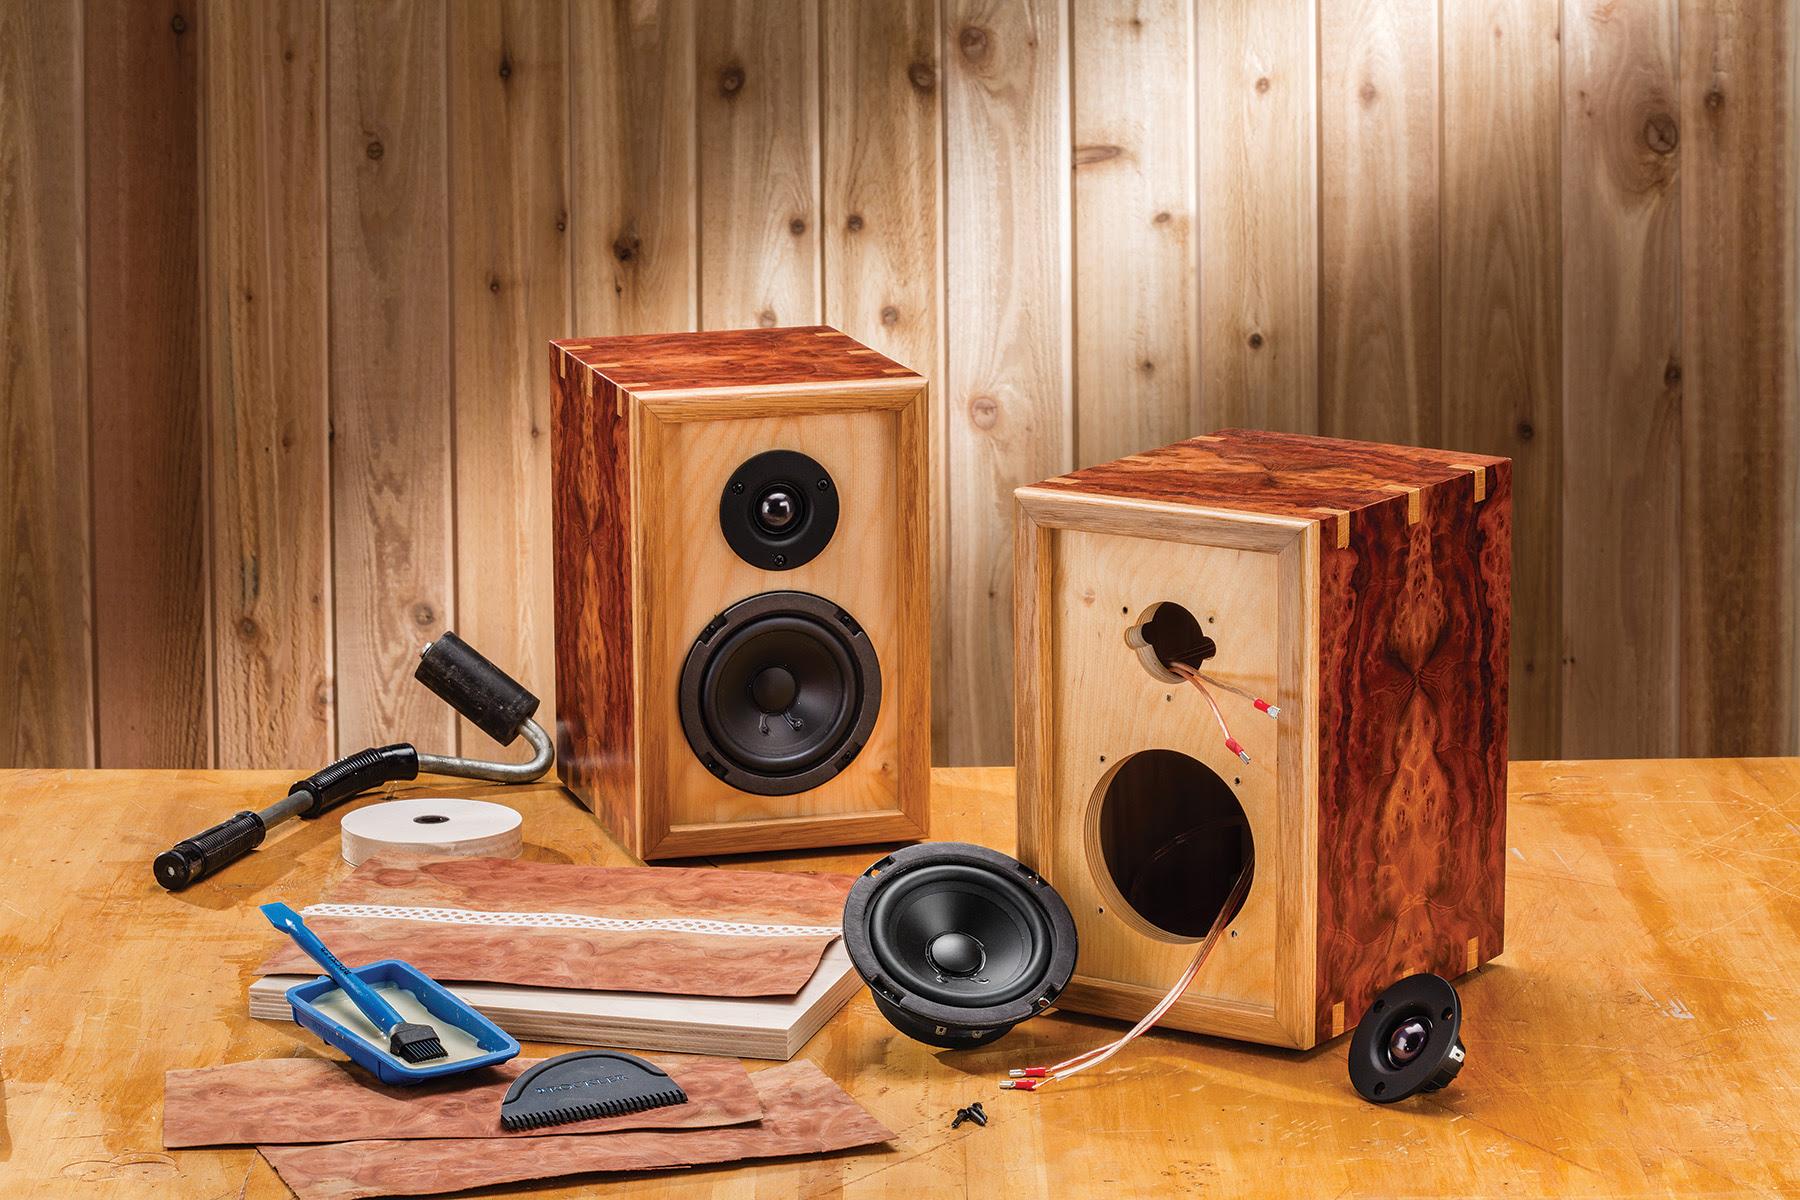 Rockler Introduces DIY Bookshelf Speaker Kits - Users ...